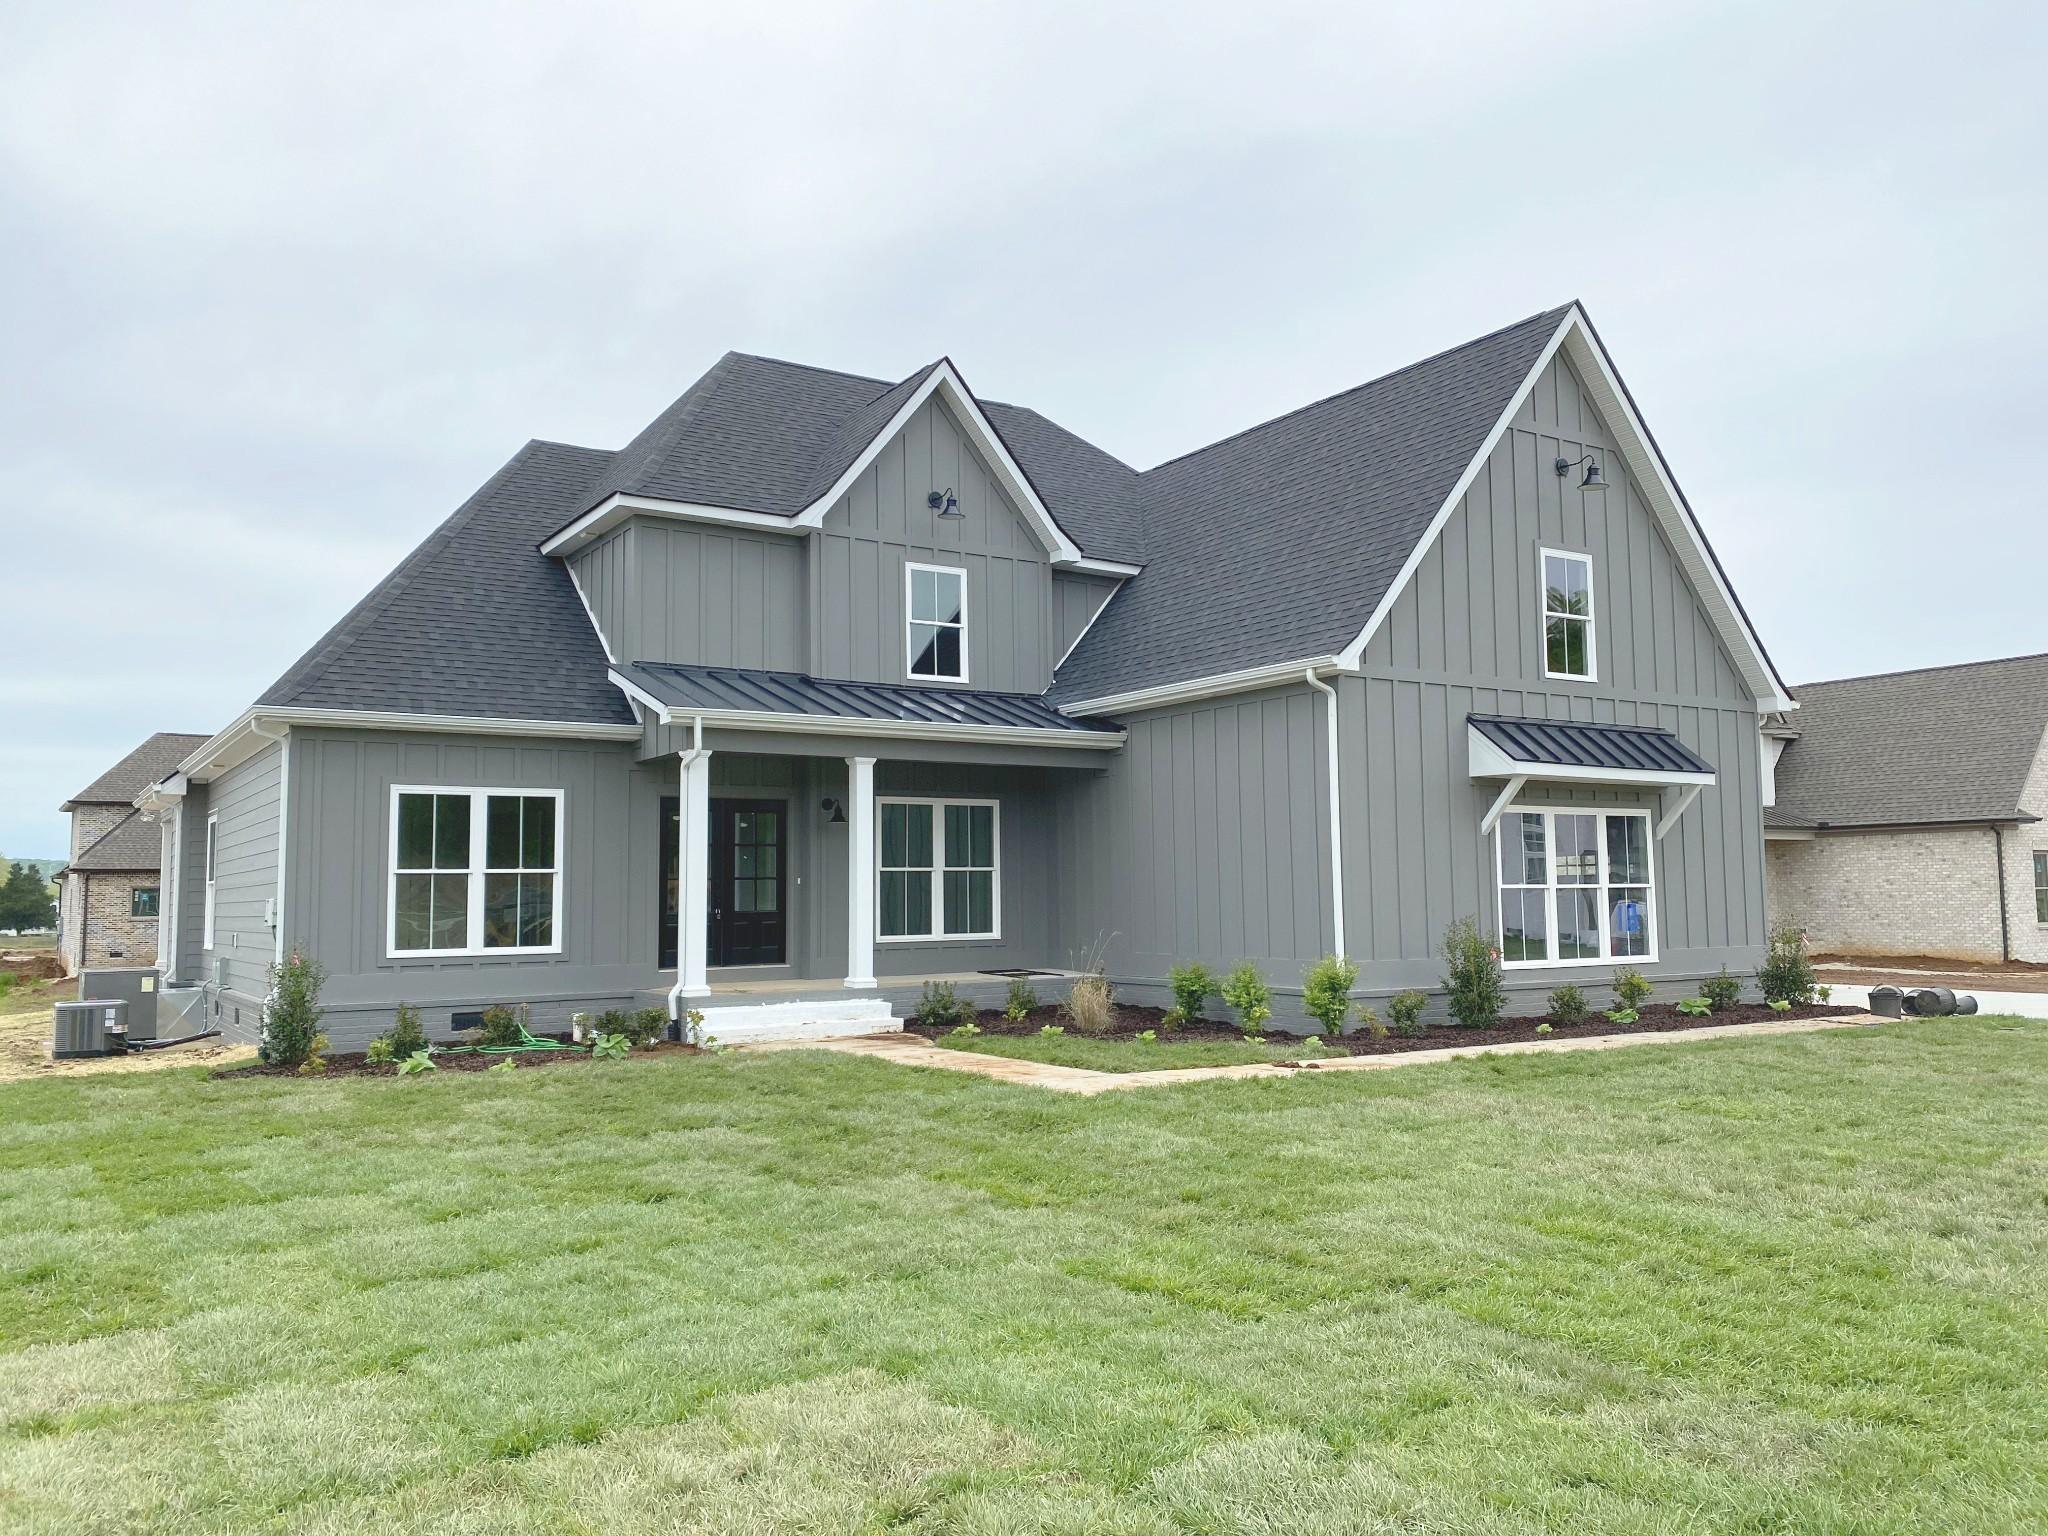 220 Seclusion Ct Property Photo - Murfreesboro, TN real estate listing